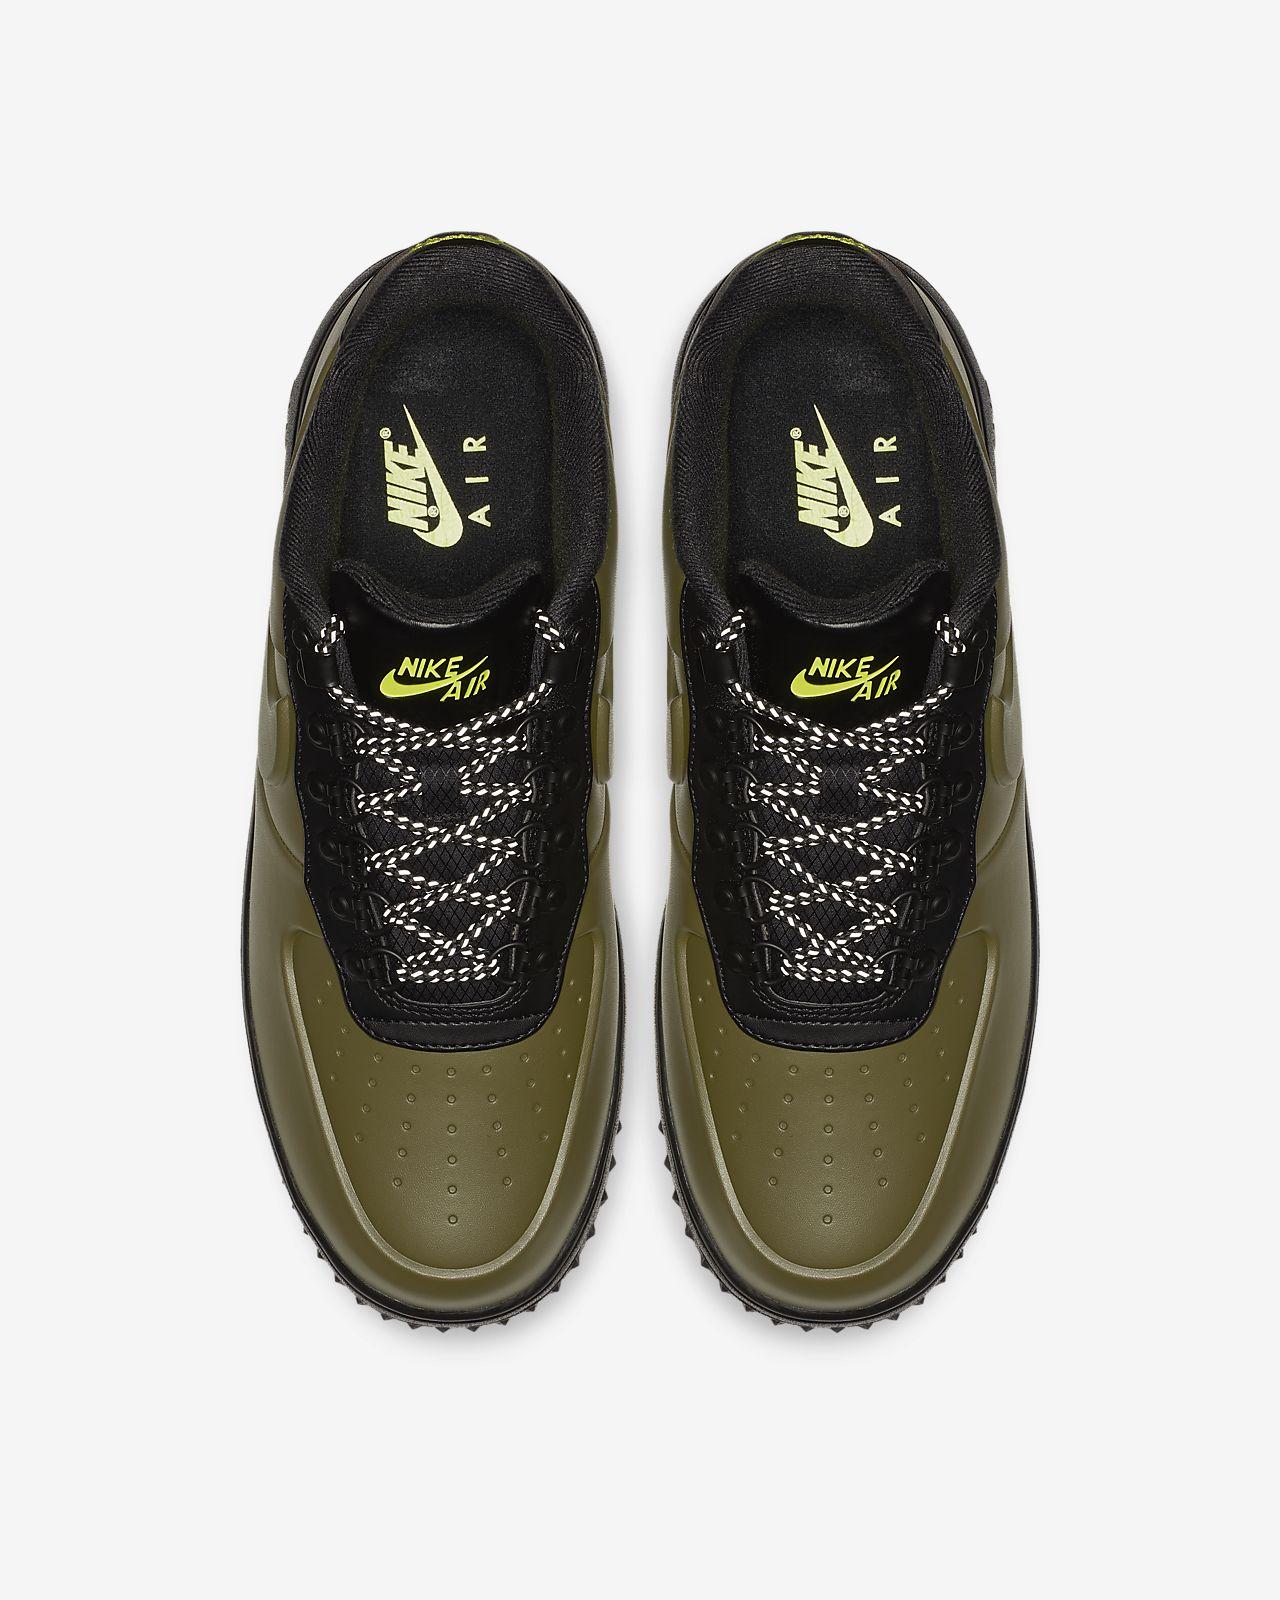 6dfb7d1cc7f Nike Lunar Force 1 Duckboot Low Men s Shoe. Nike.com ZA